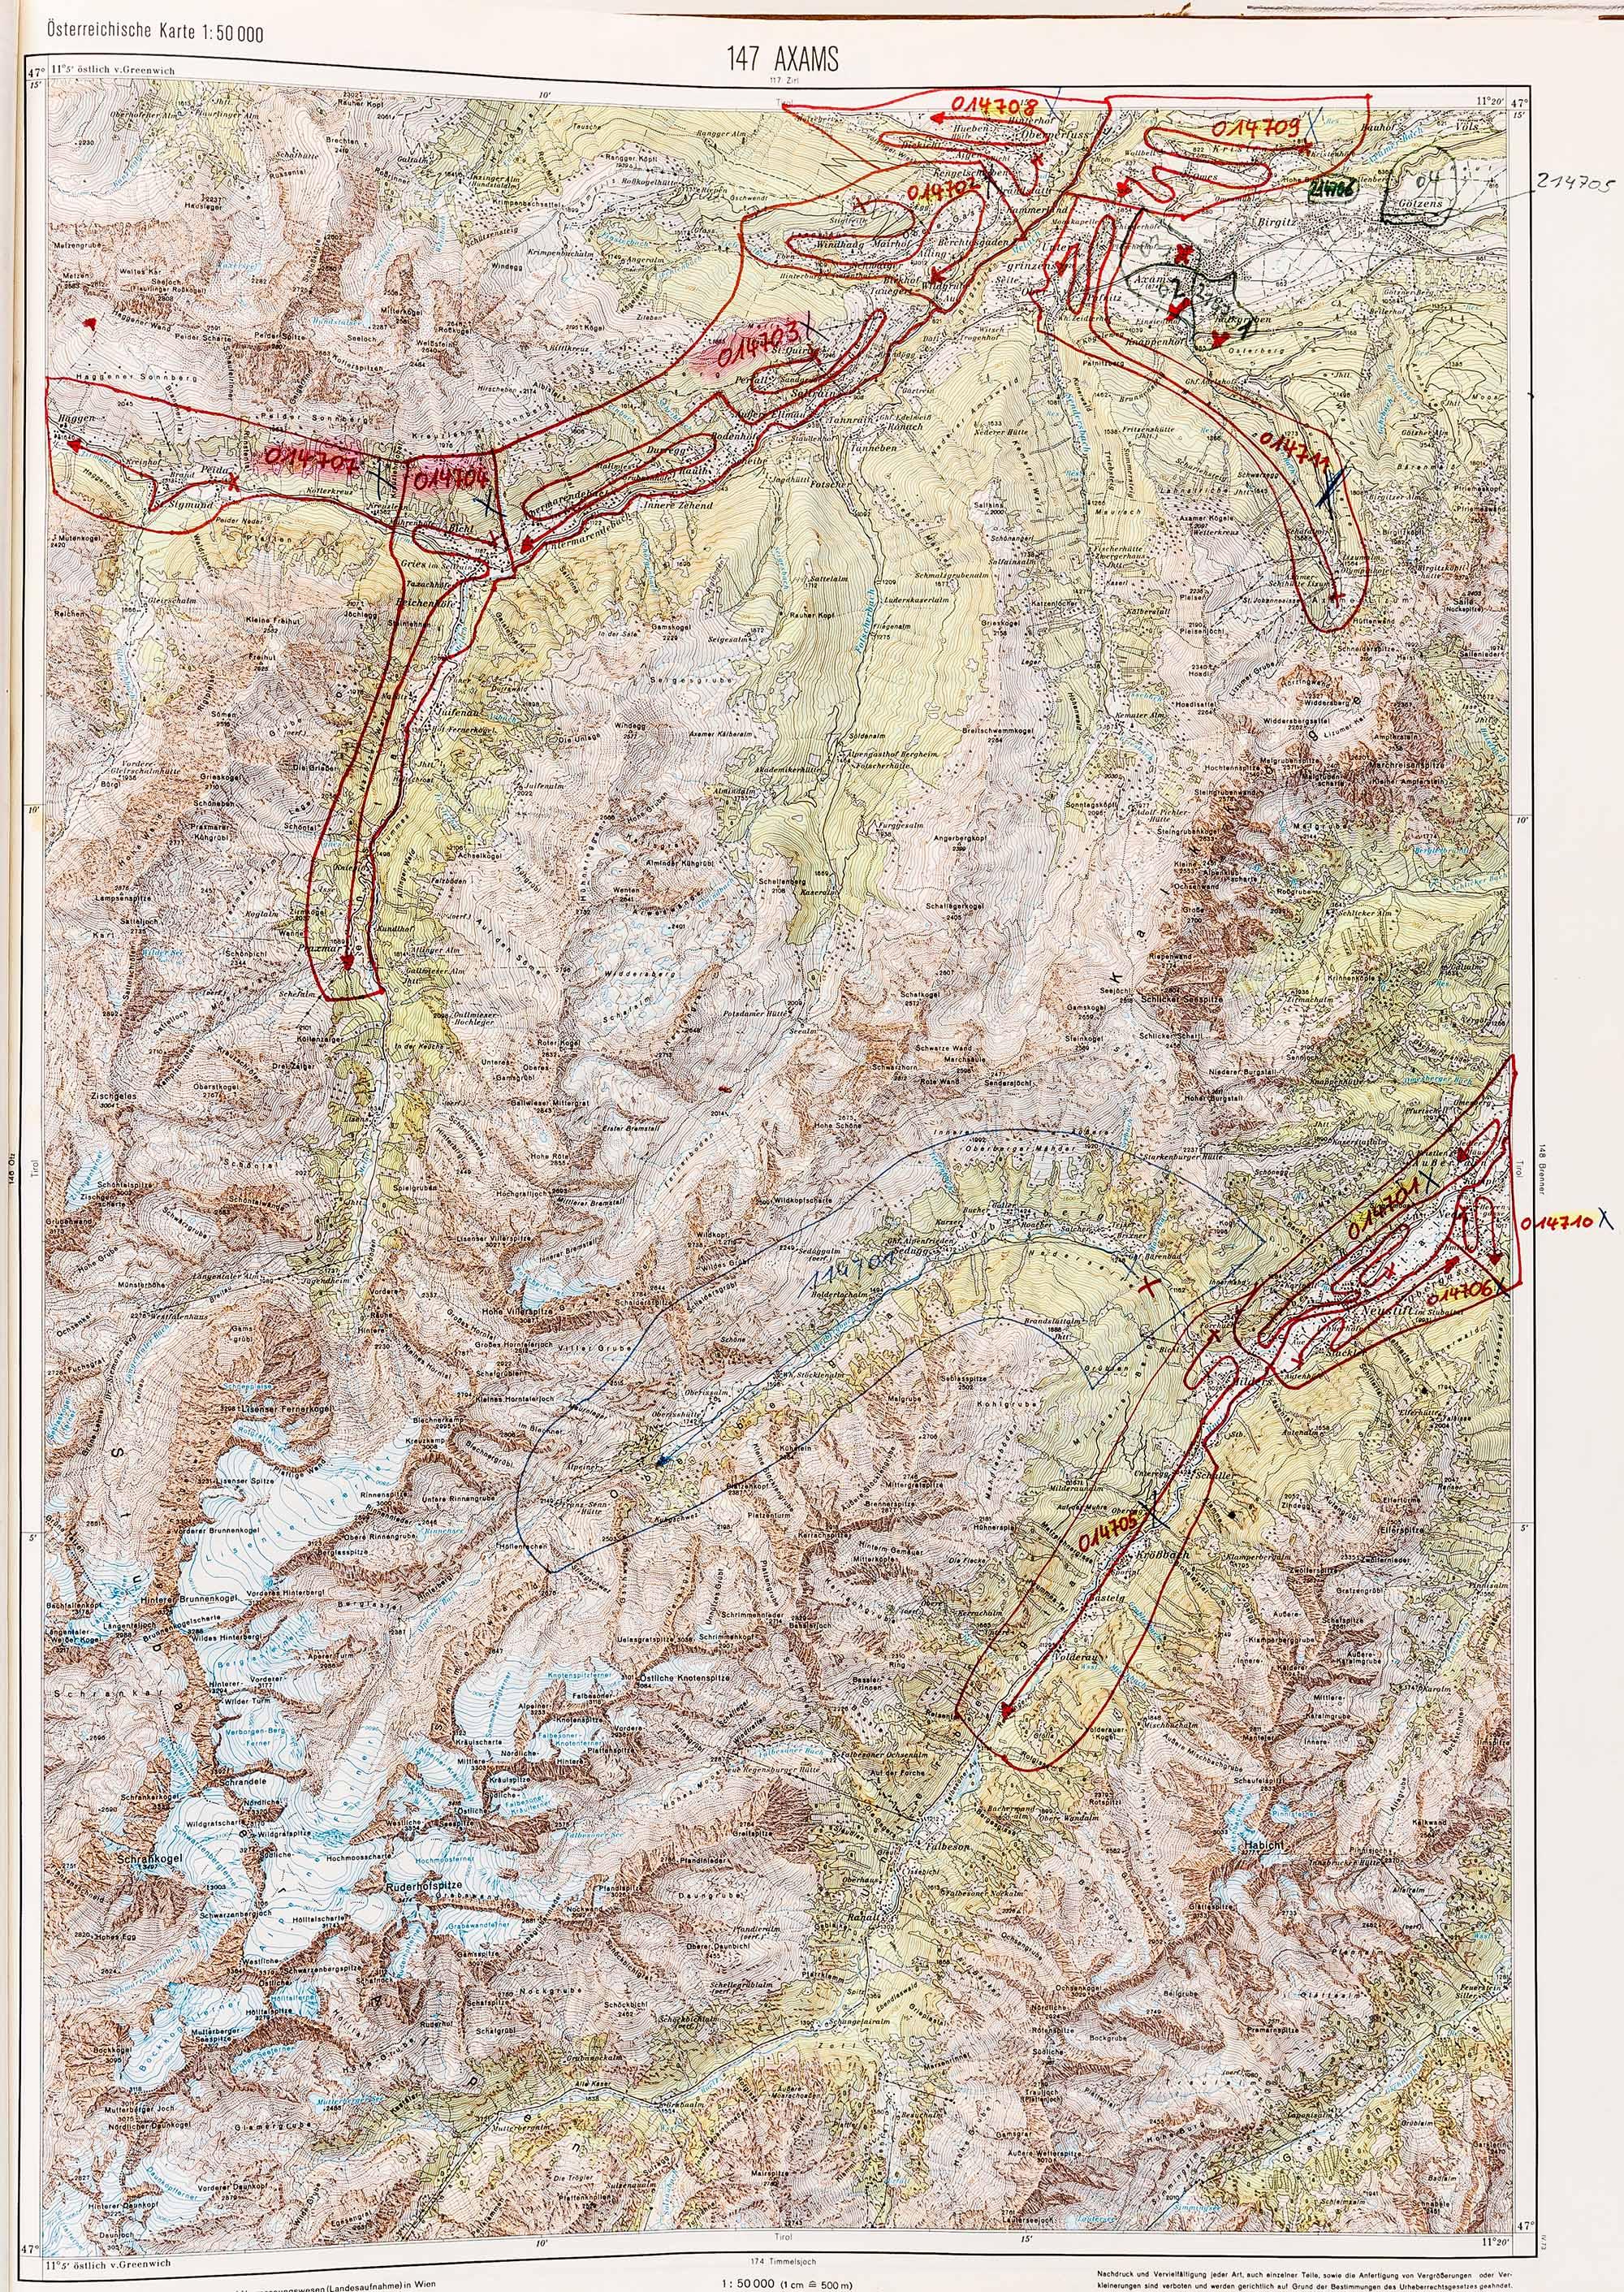 1979-1982 Karte 147